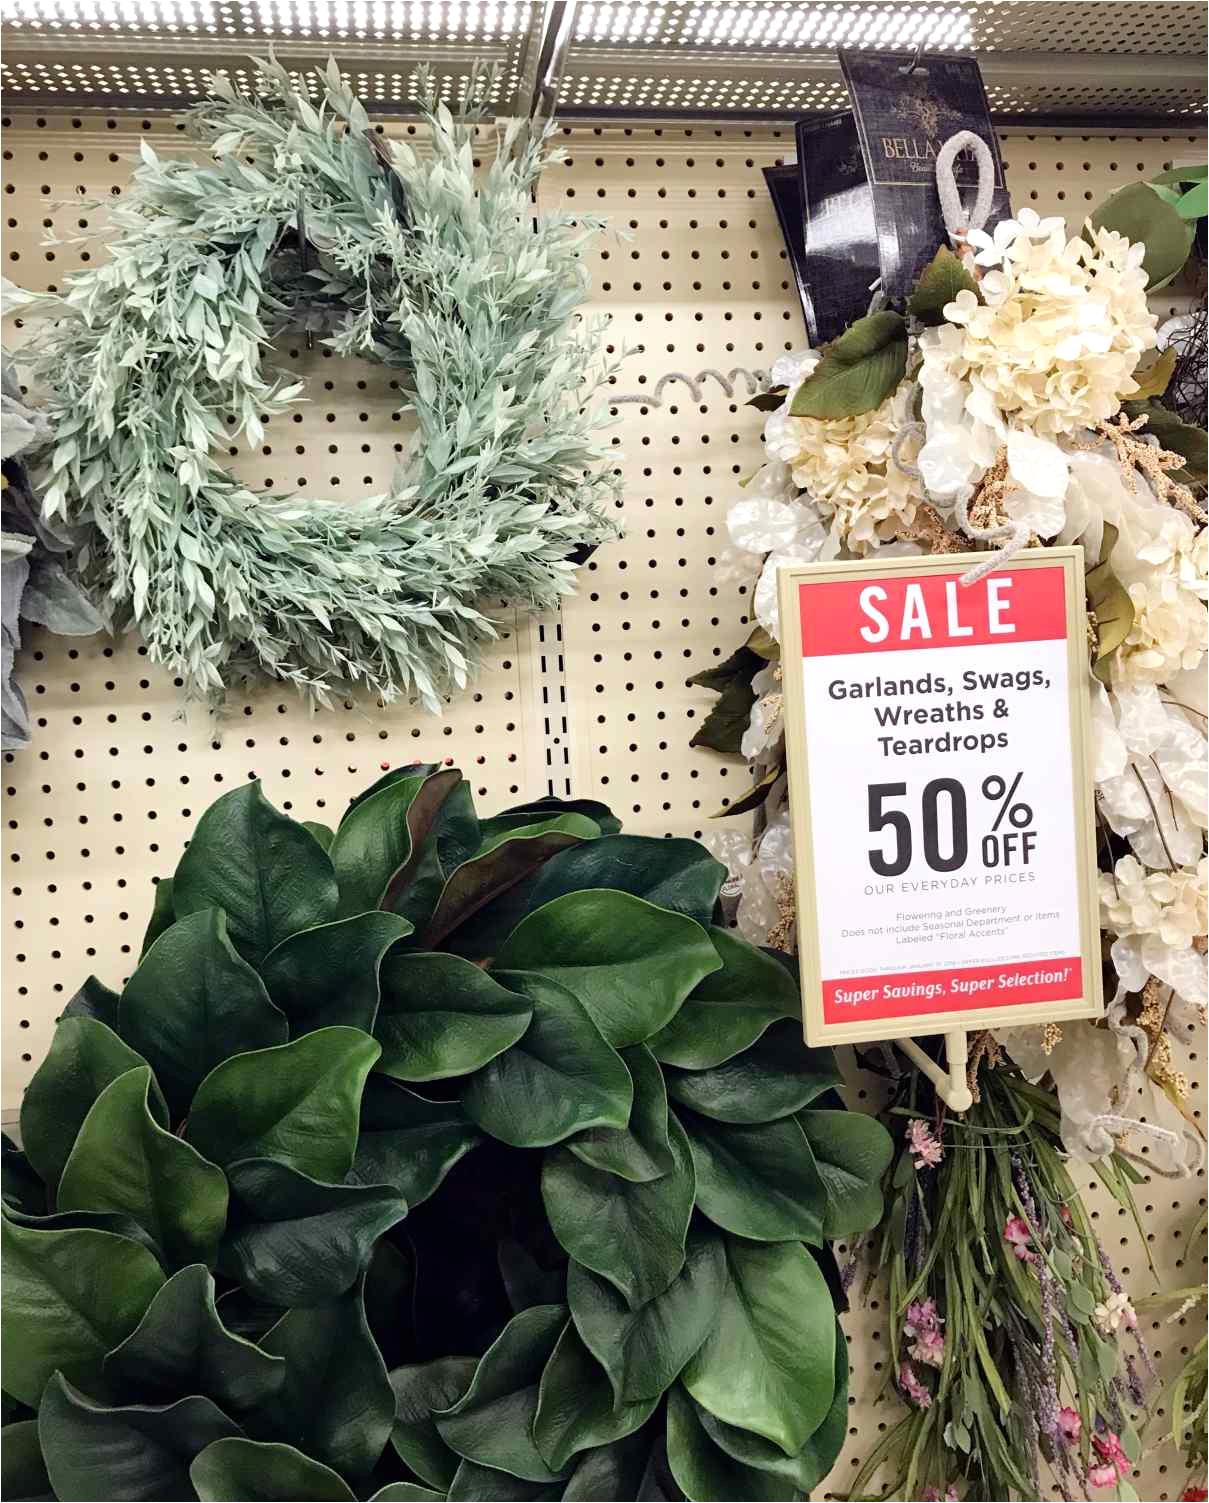 gallery of merry christmas banner hobby lobby new hobby lobby fabric stores 9717 e 71st st union tulsa ok